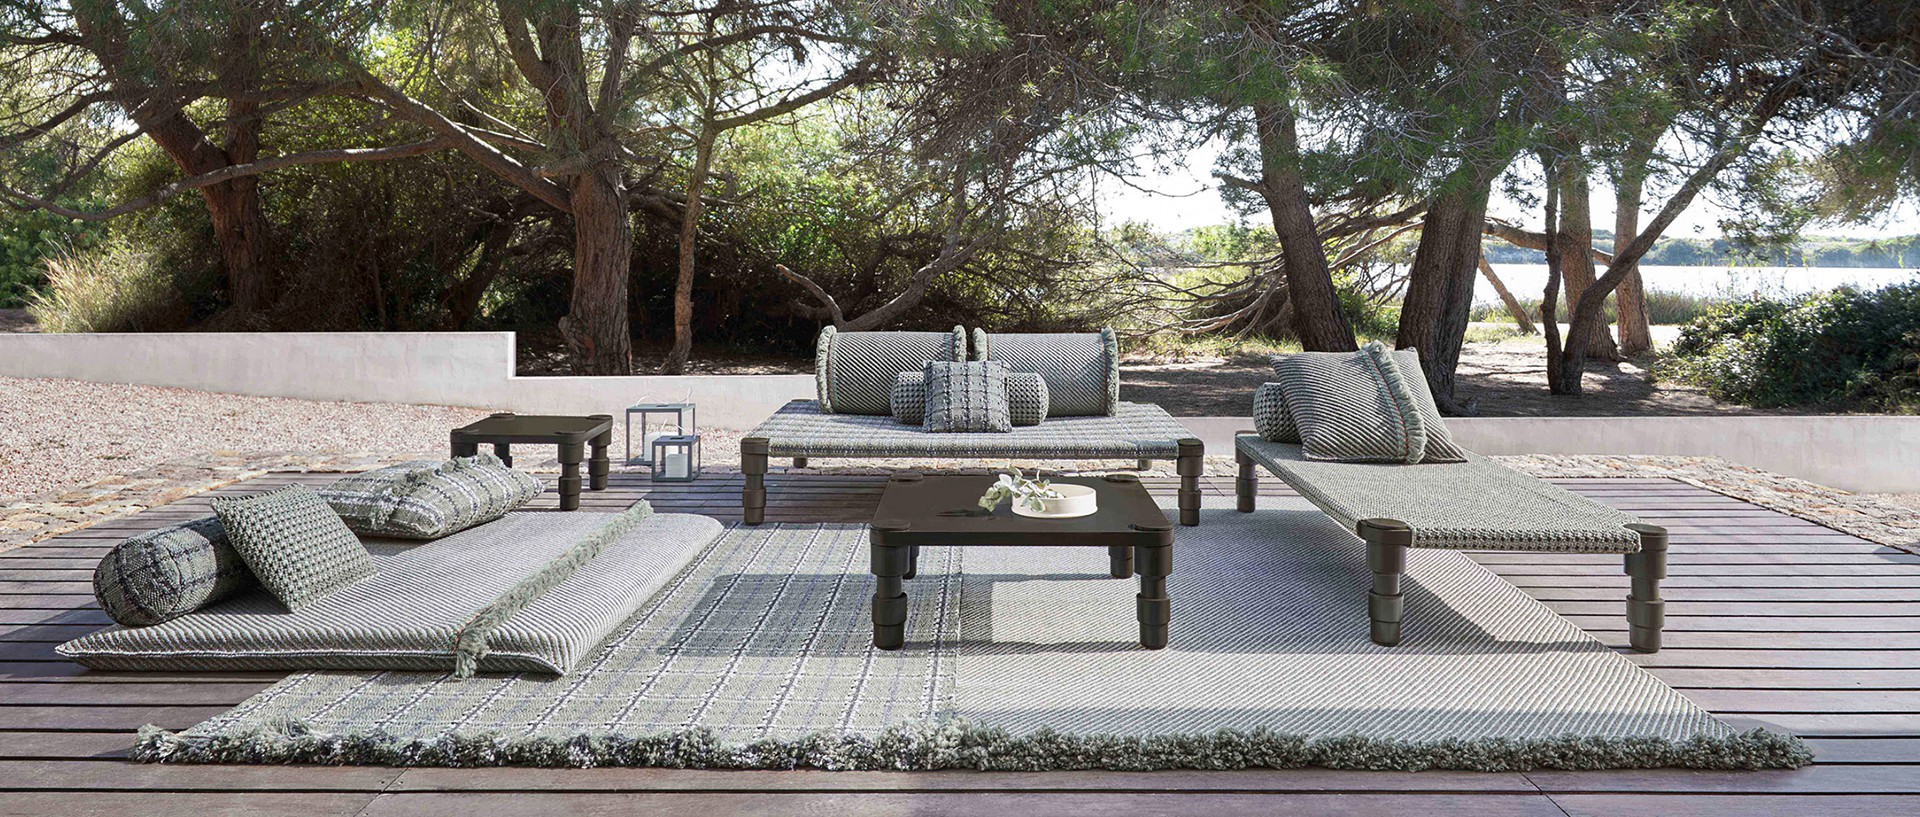 GARDEN LAYER de PATRICIA URQUIOLA, toute une collection outdoor de daybed, tapis, coussins, matelas